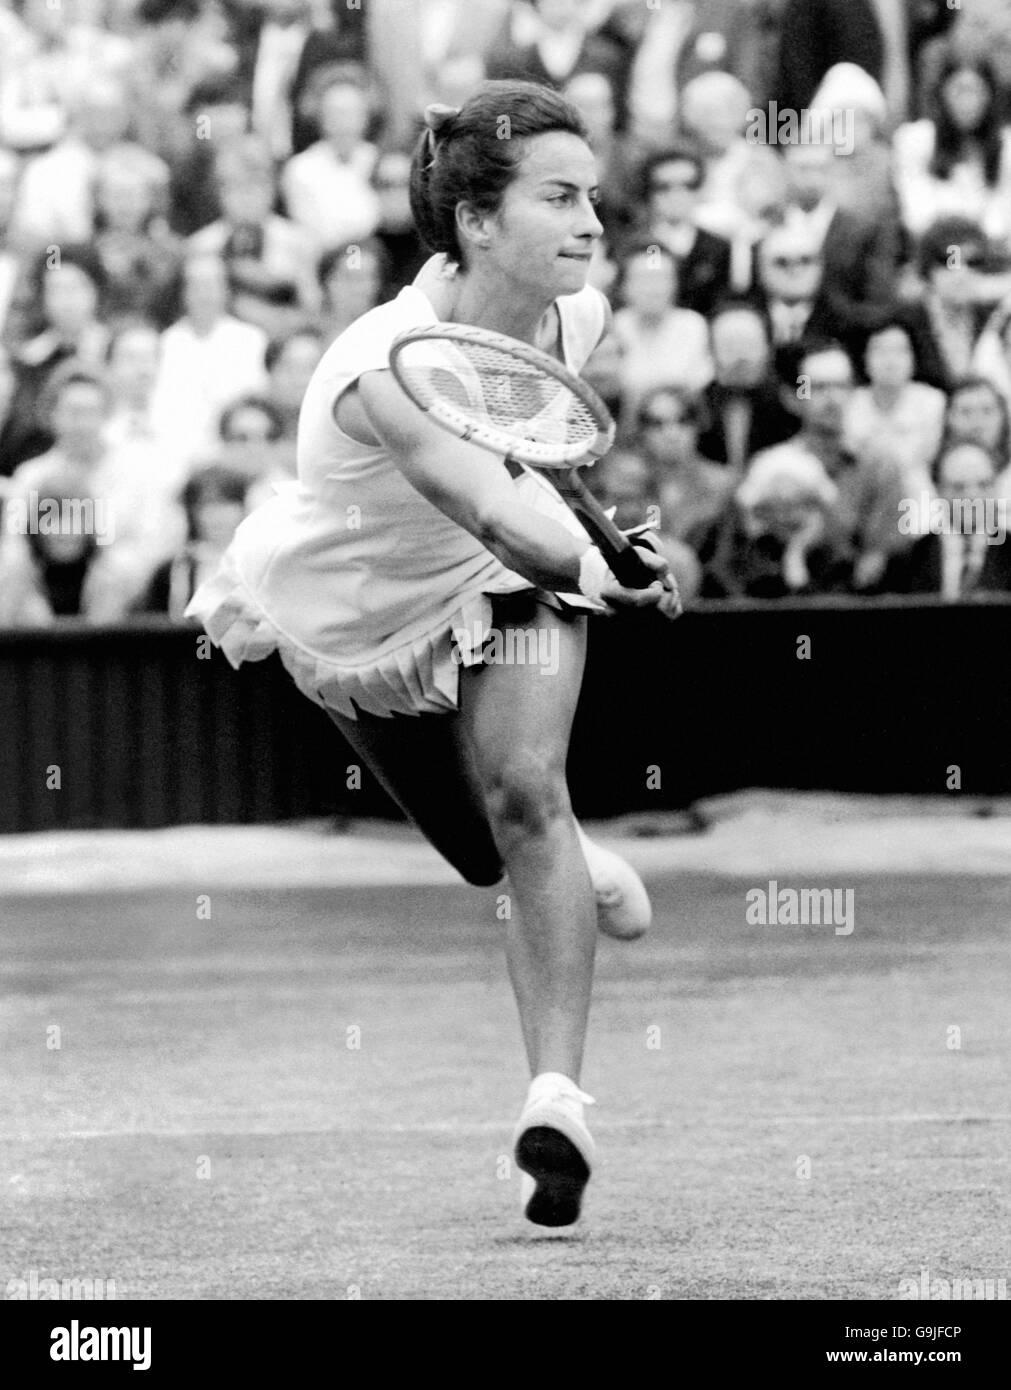 Tennis Wimbledon Championships Womens Singles Virginia Wade